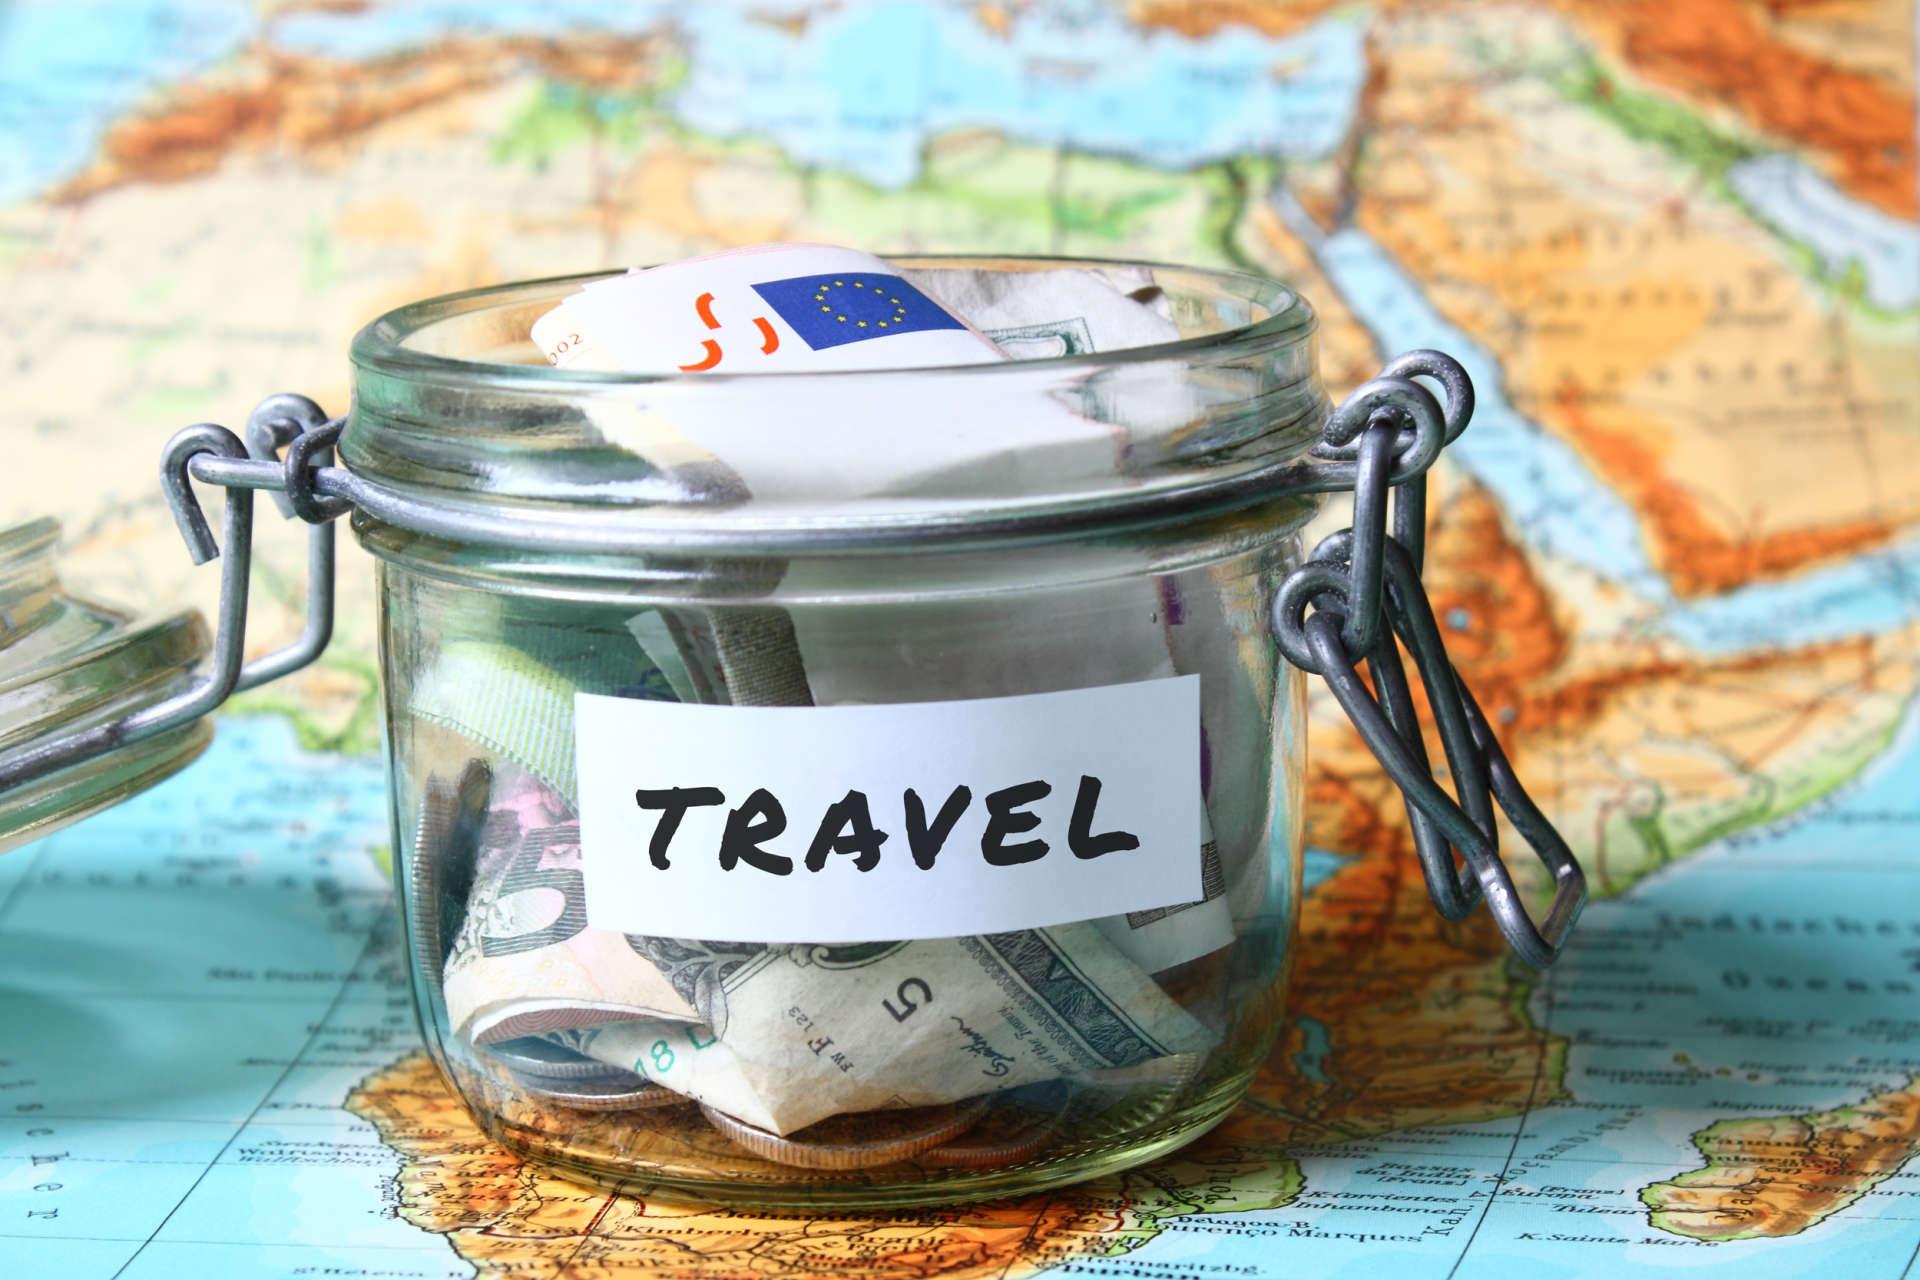 Travel (13)